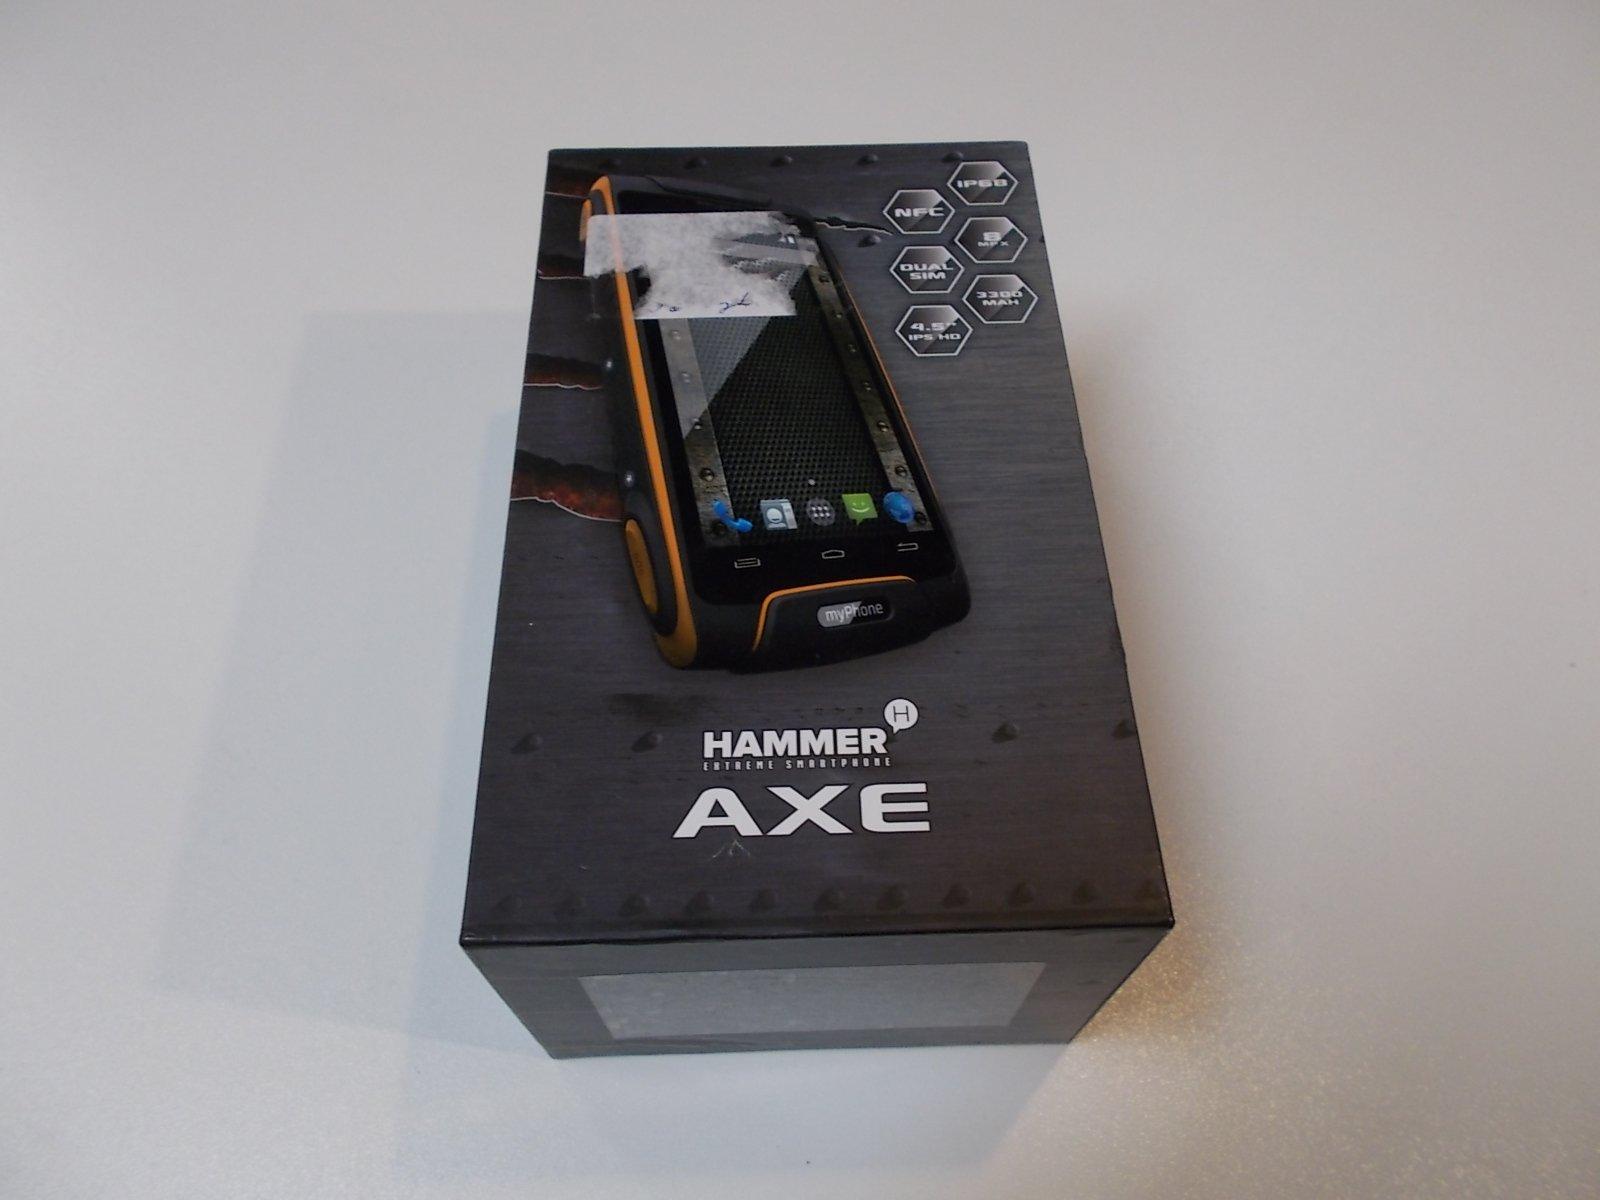 myPhone HAMMER AXE - USZKODZONY DOTYK - Opole